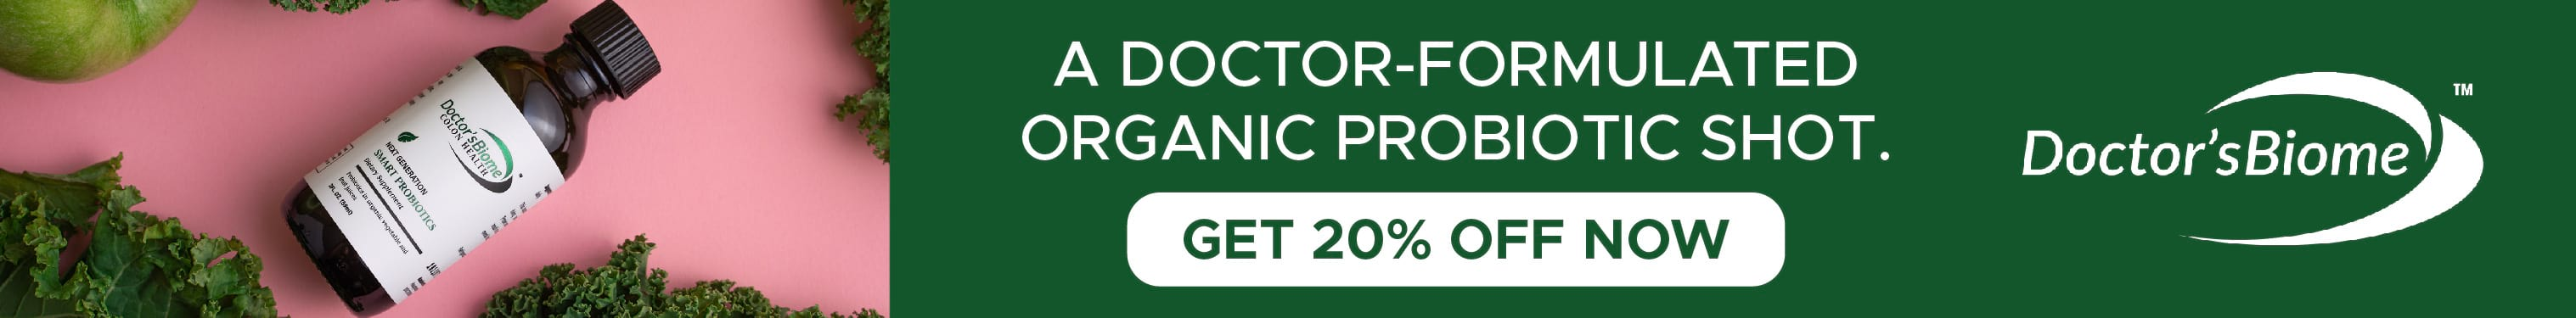 https://www.voiceamerica.com/content/images/show_images/3954/be/DoctorsBiomeBannerAd1.jpg